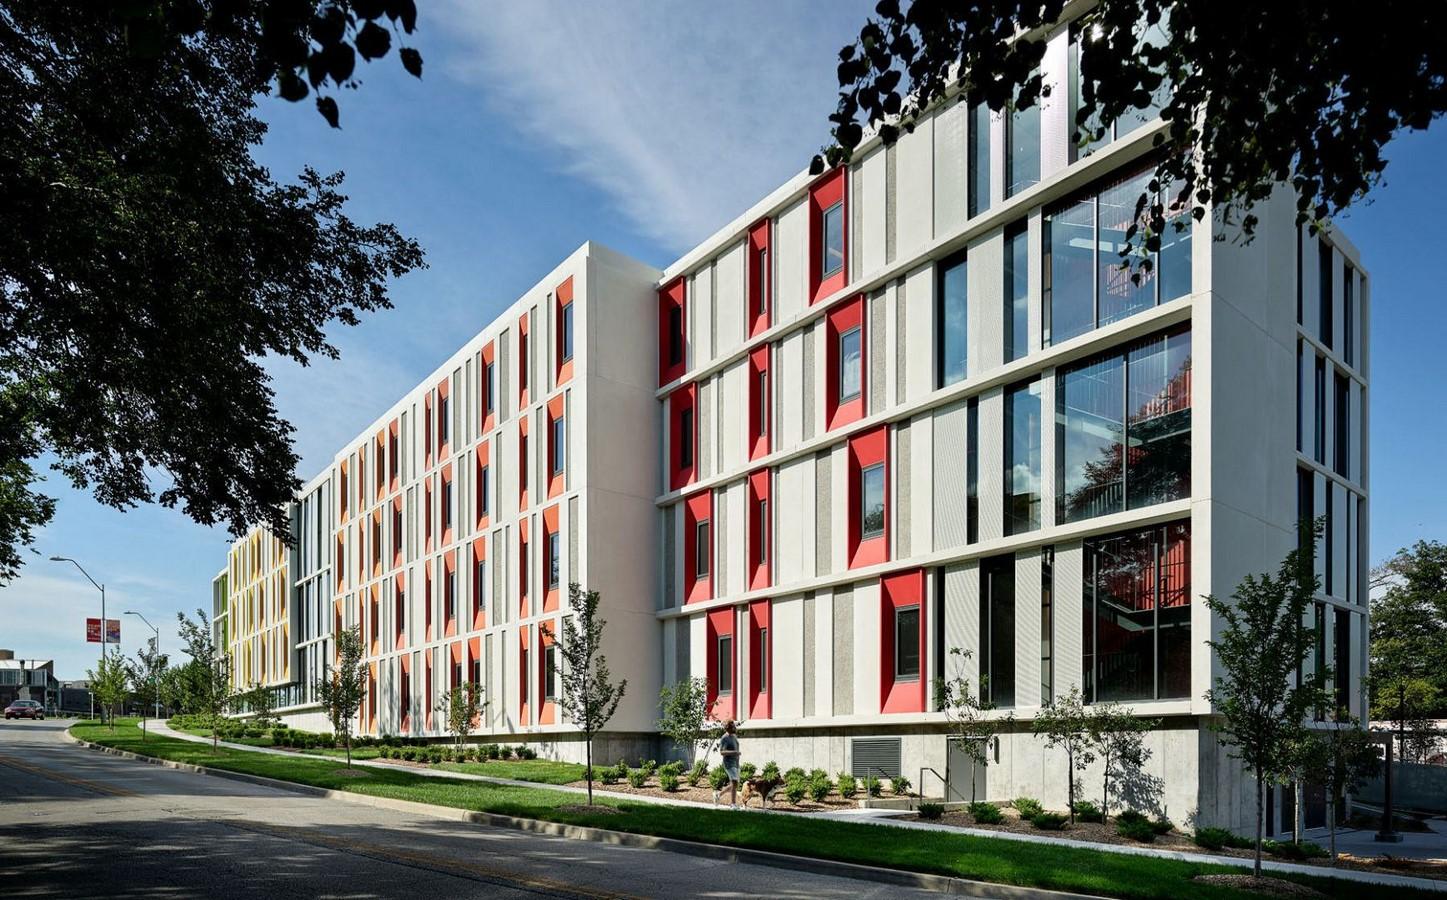 Architects in Kansas city - Top 90 Architects in Kansas city - Sheet28